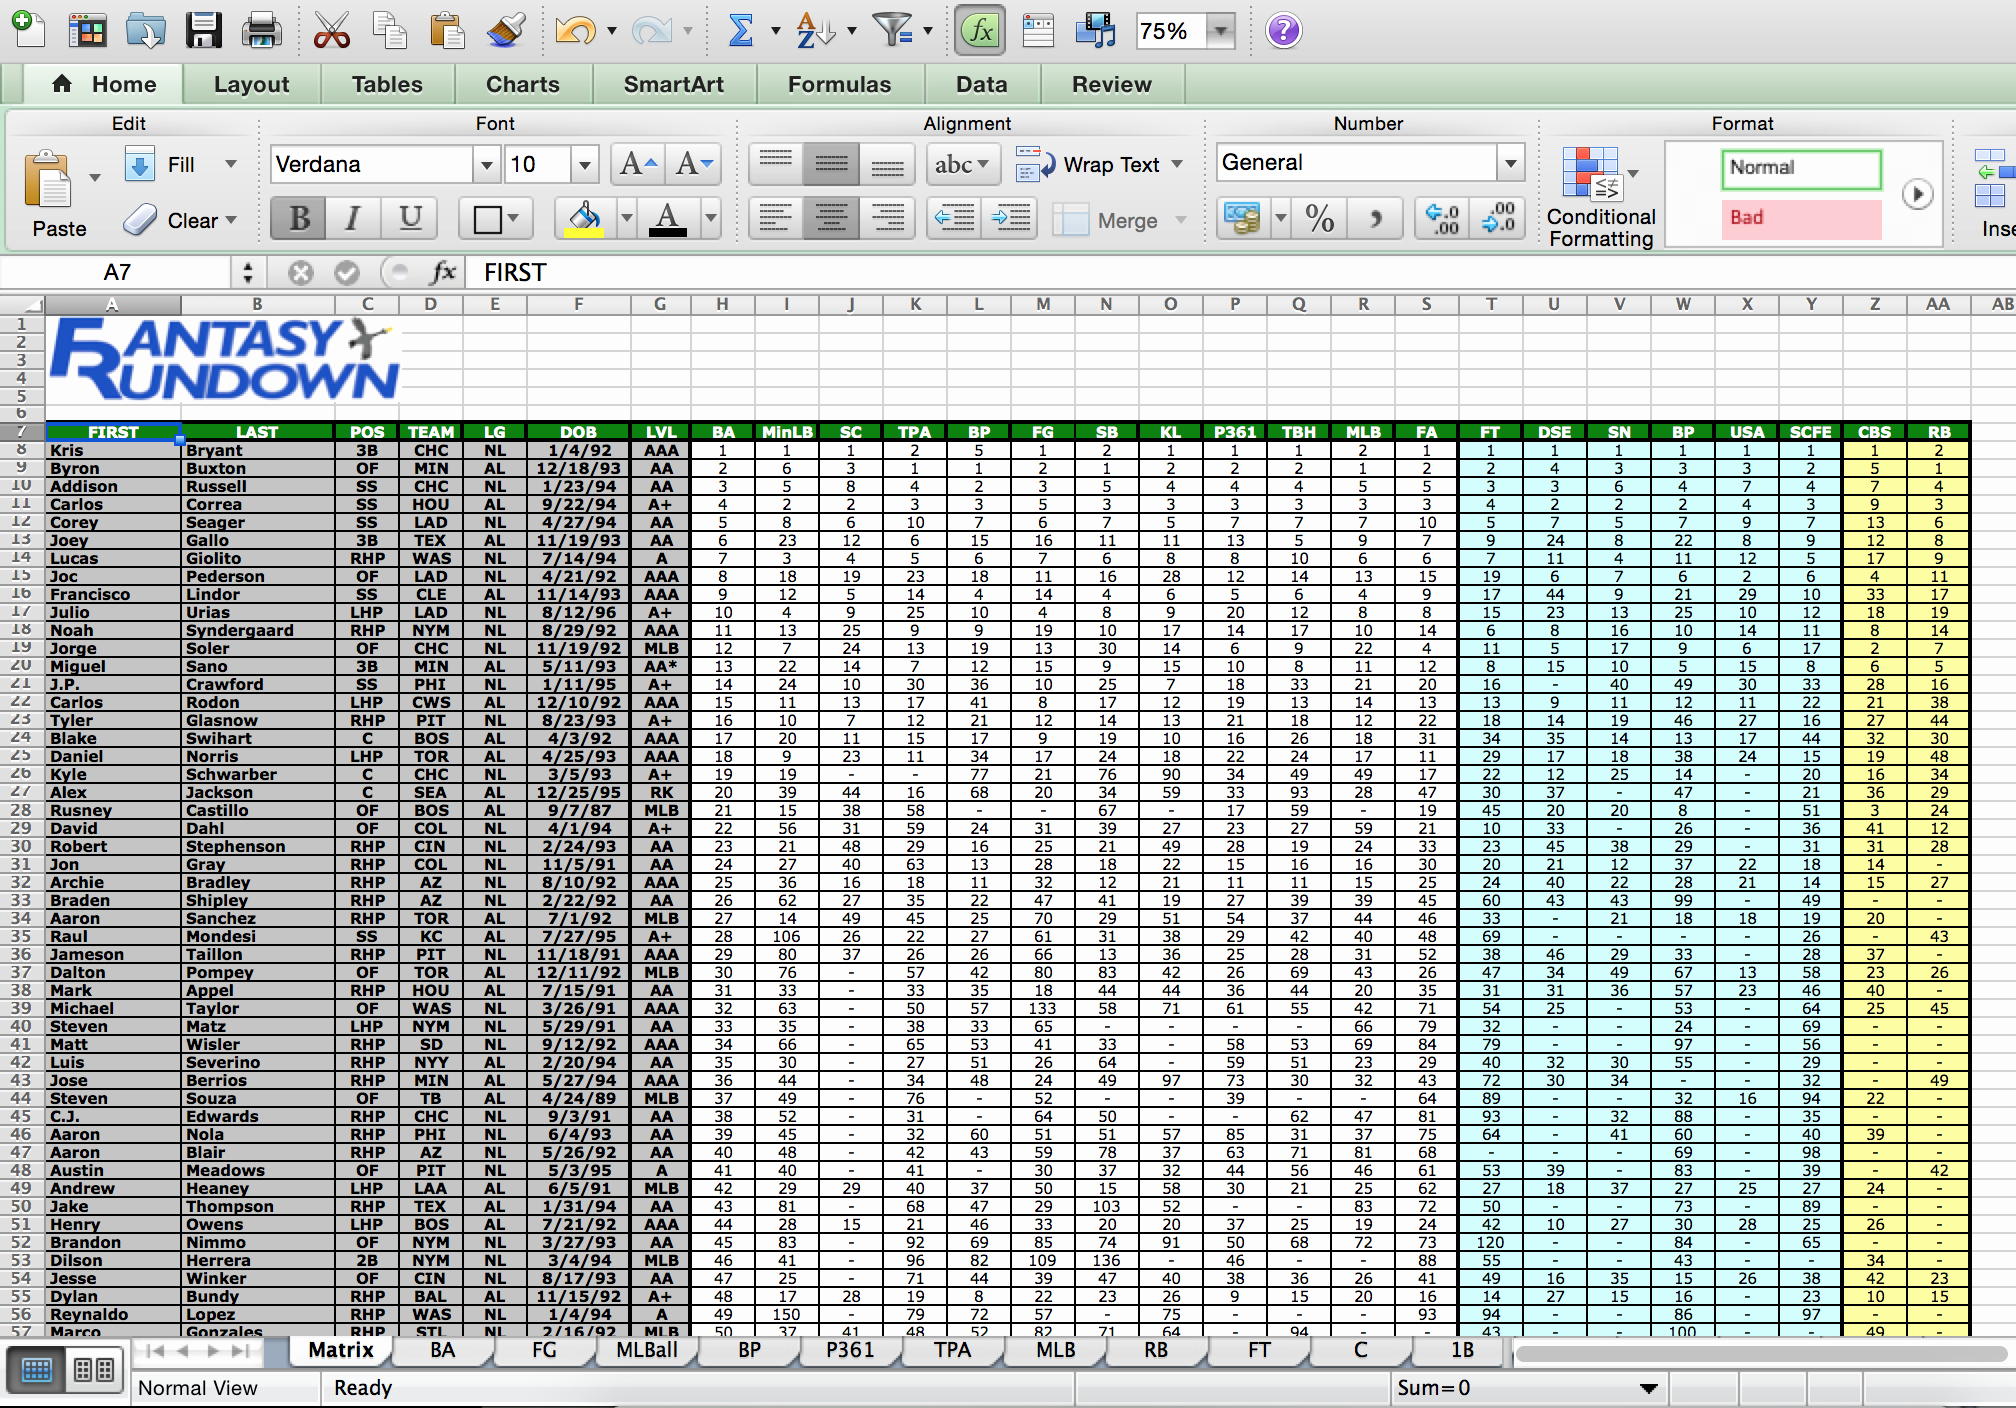 Nfl Scores Spreadsheet For Nfl Schedule Spreadsheet New Nfl Schedule 2018 Photos Jen Hill